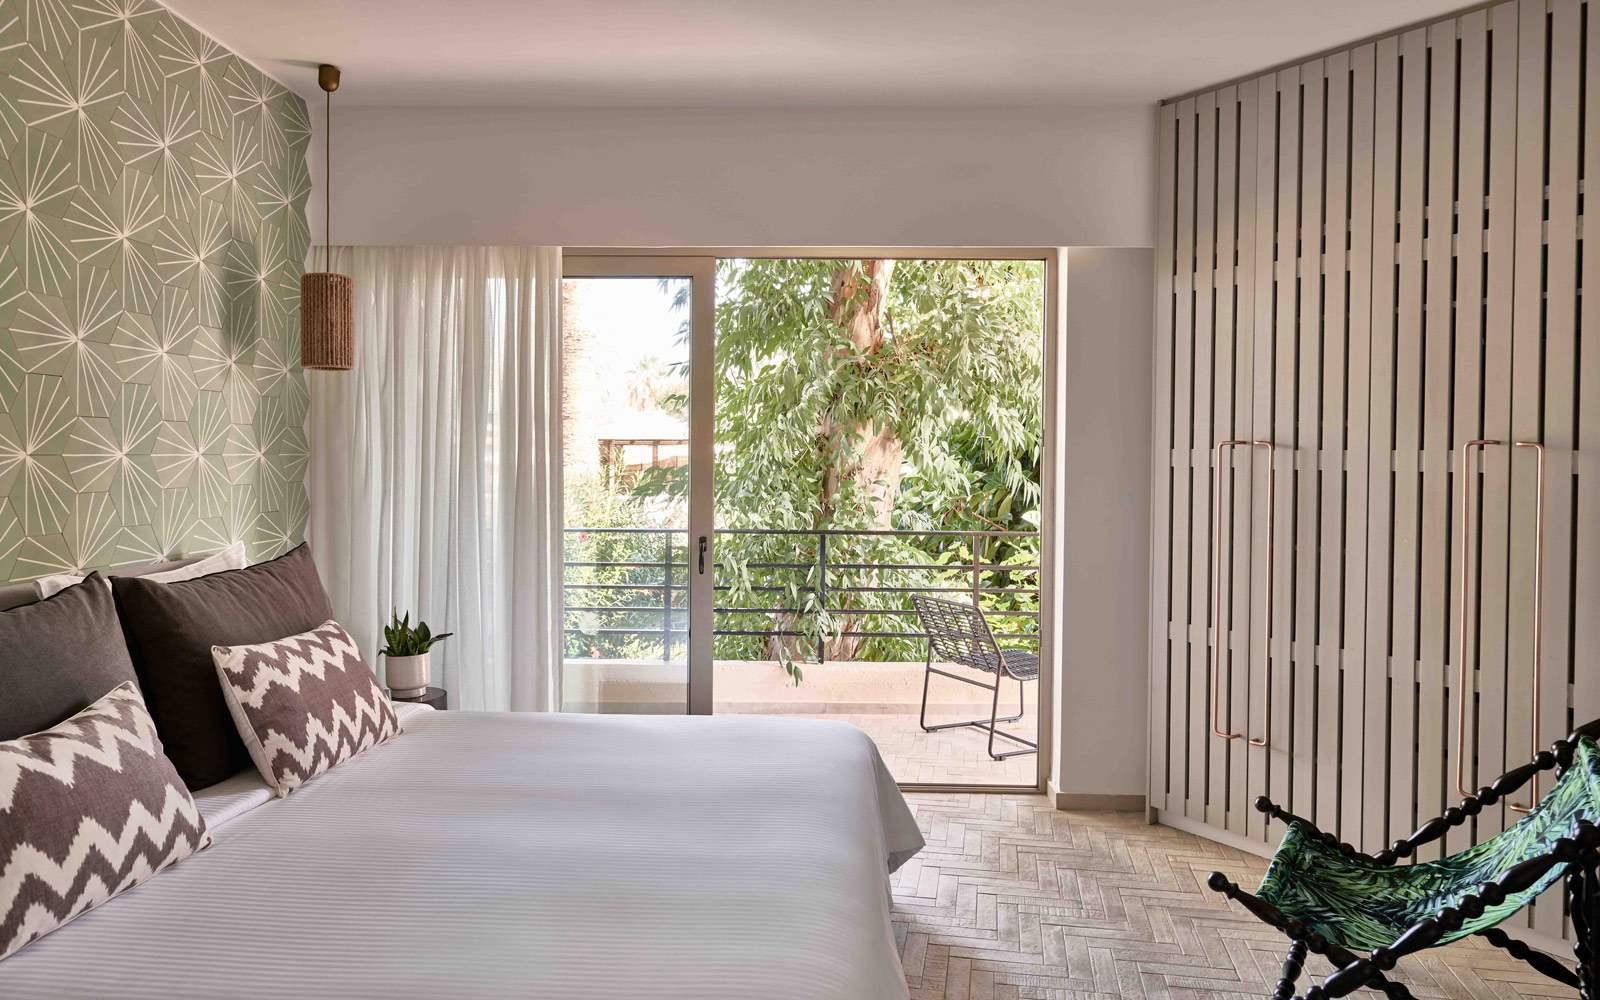 Cretan Malia Park One Bedroom Suite